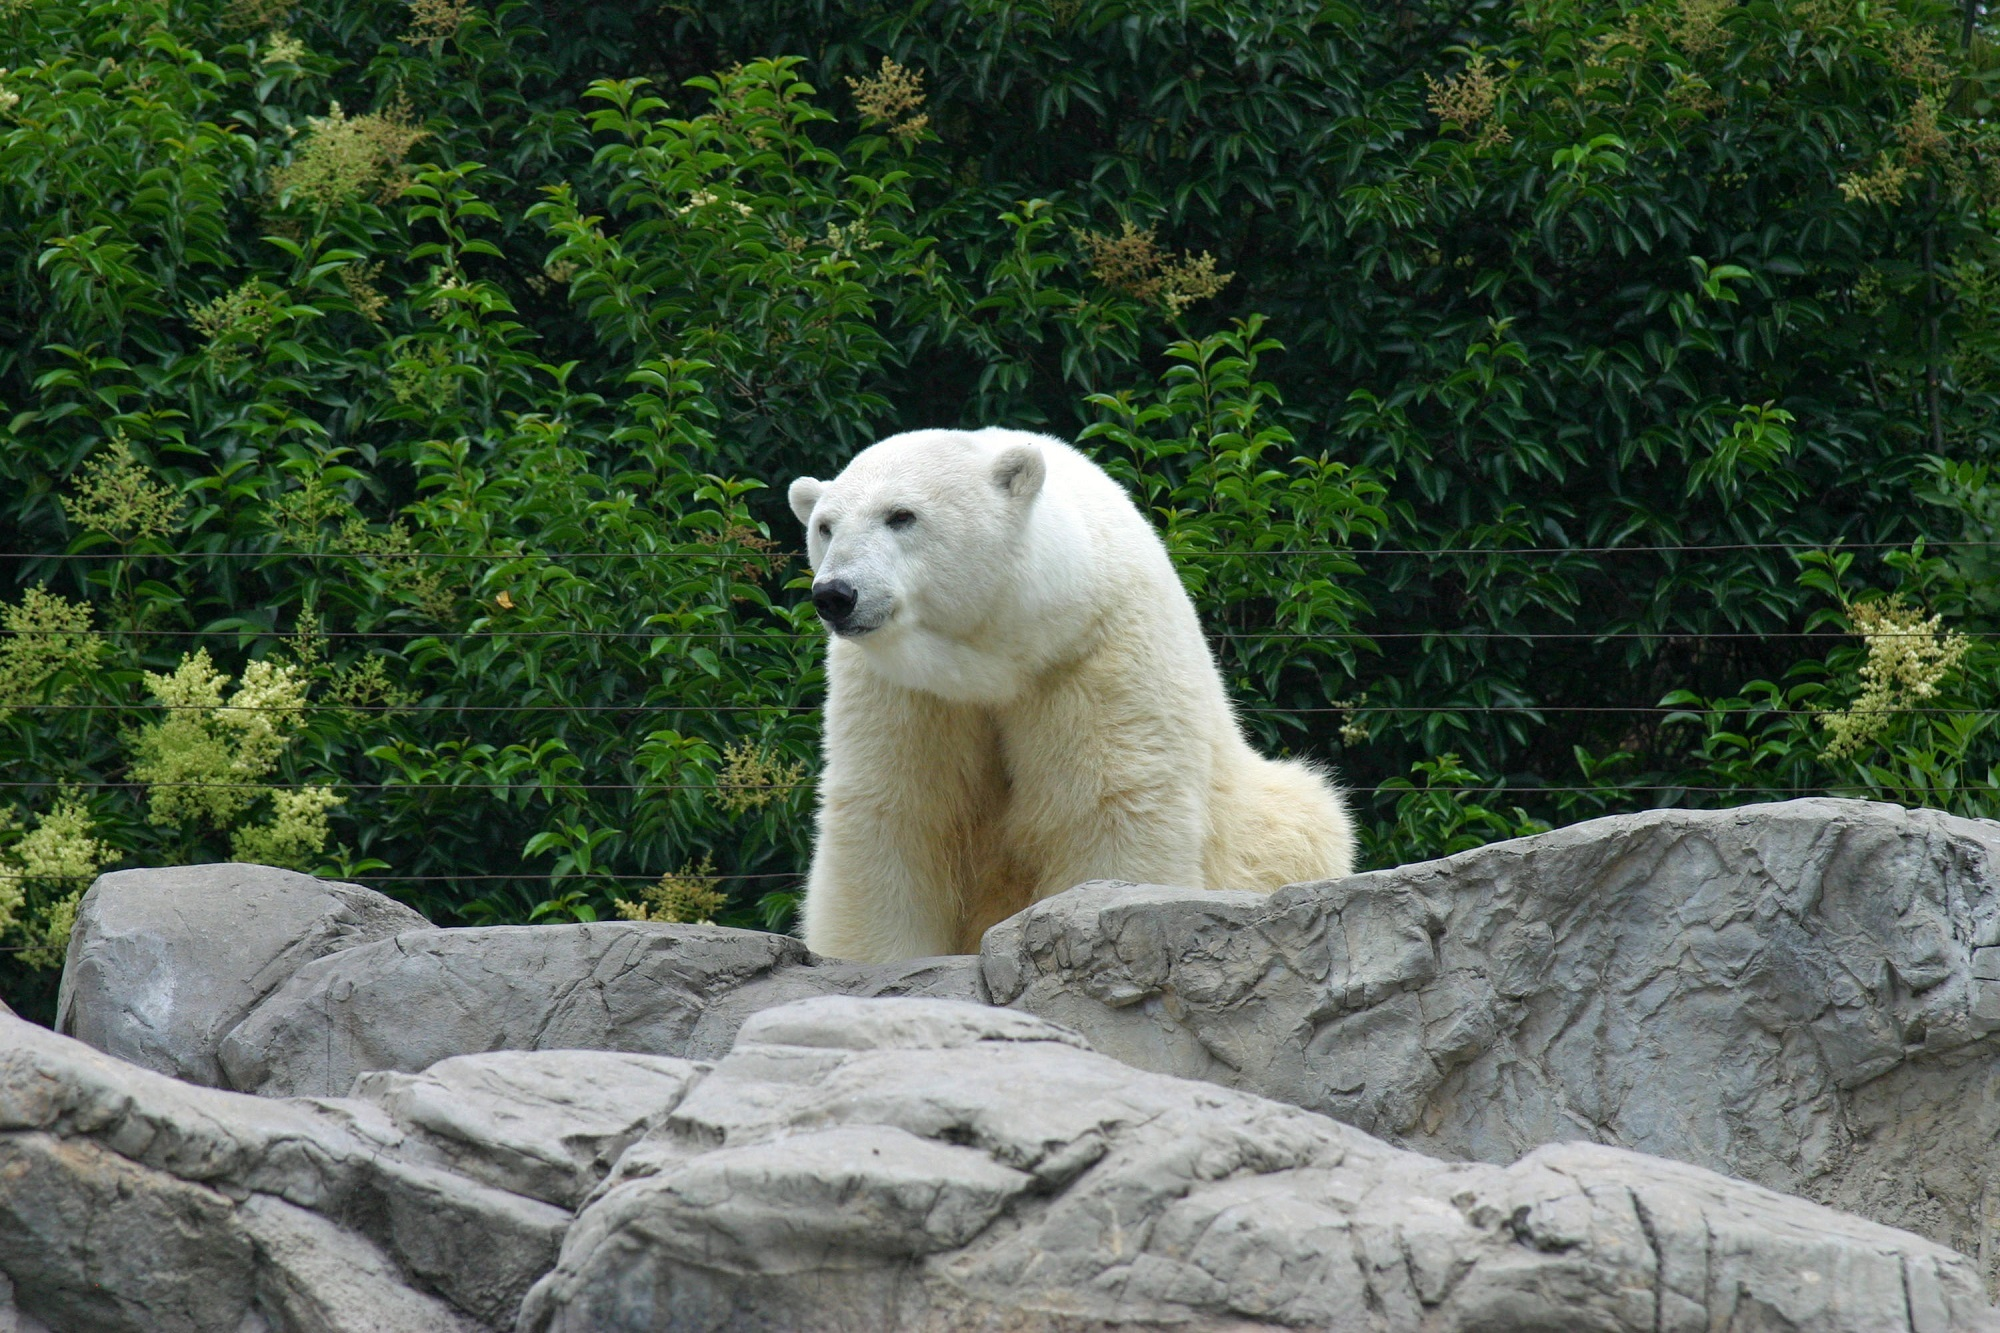 84649 Hintergrundbild herunterladen Tiere, Stones, Bär, Raubtier, Predator, Eisbär, Polarbär - Bildschirmschoner und Bilder kostenlos